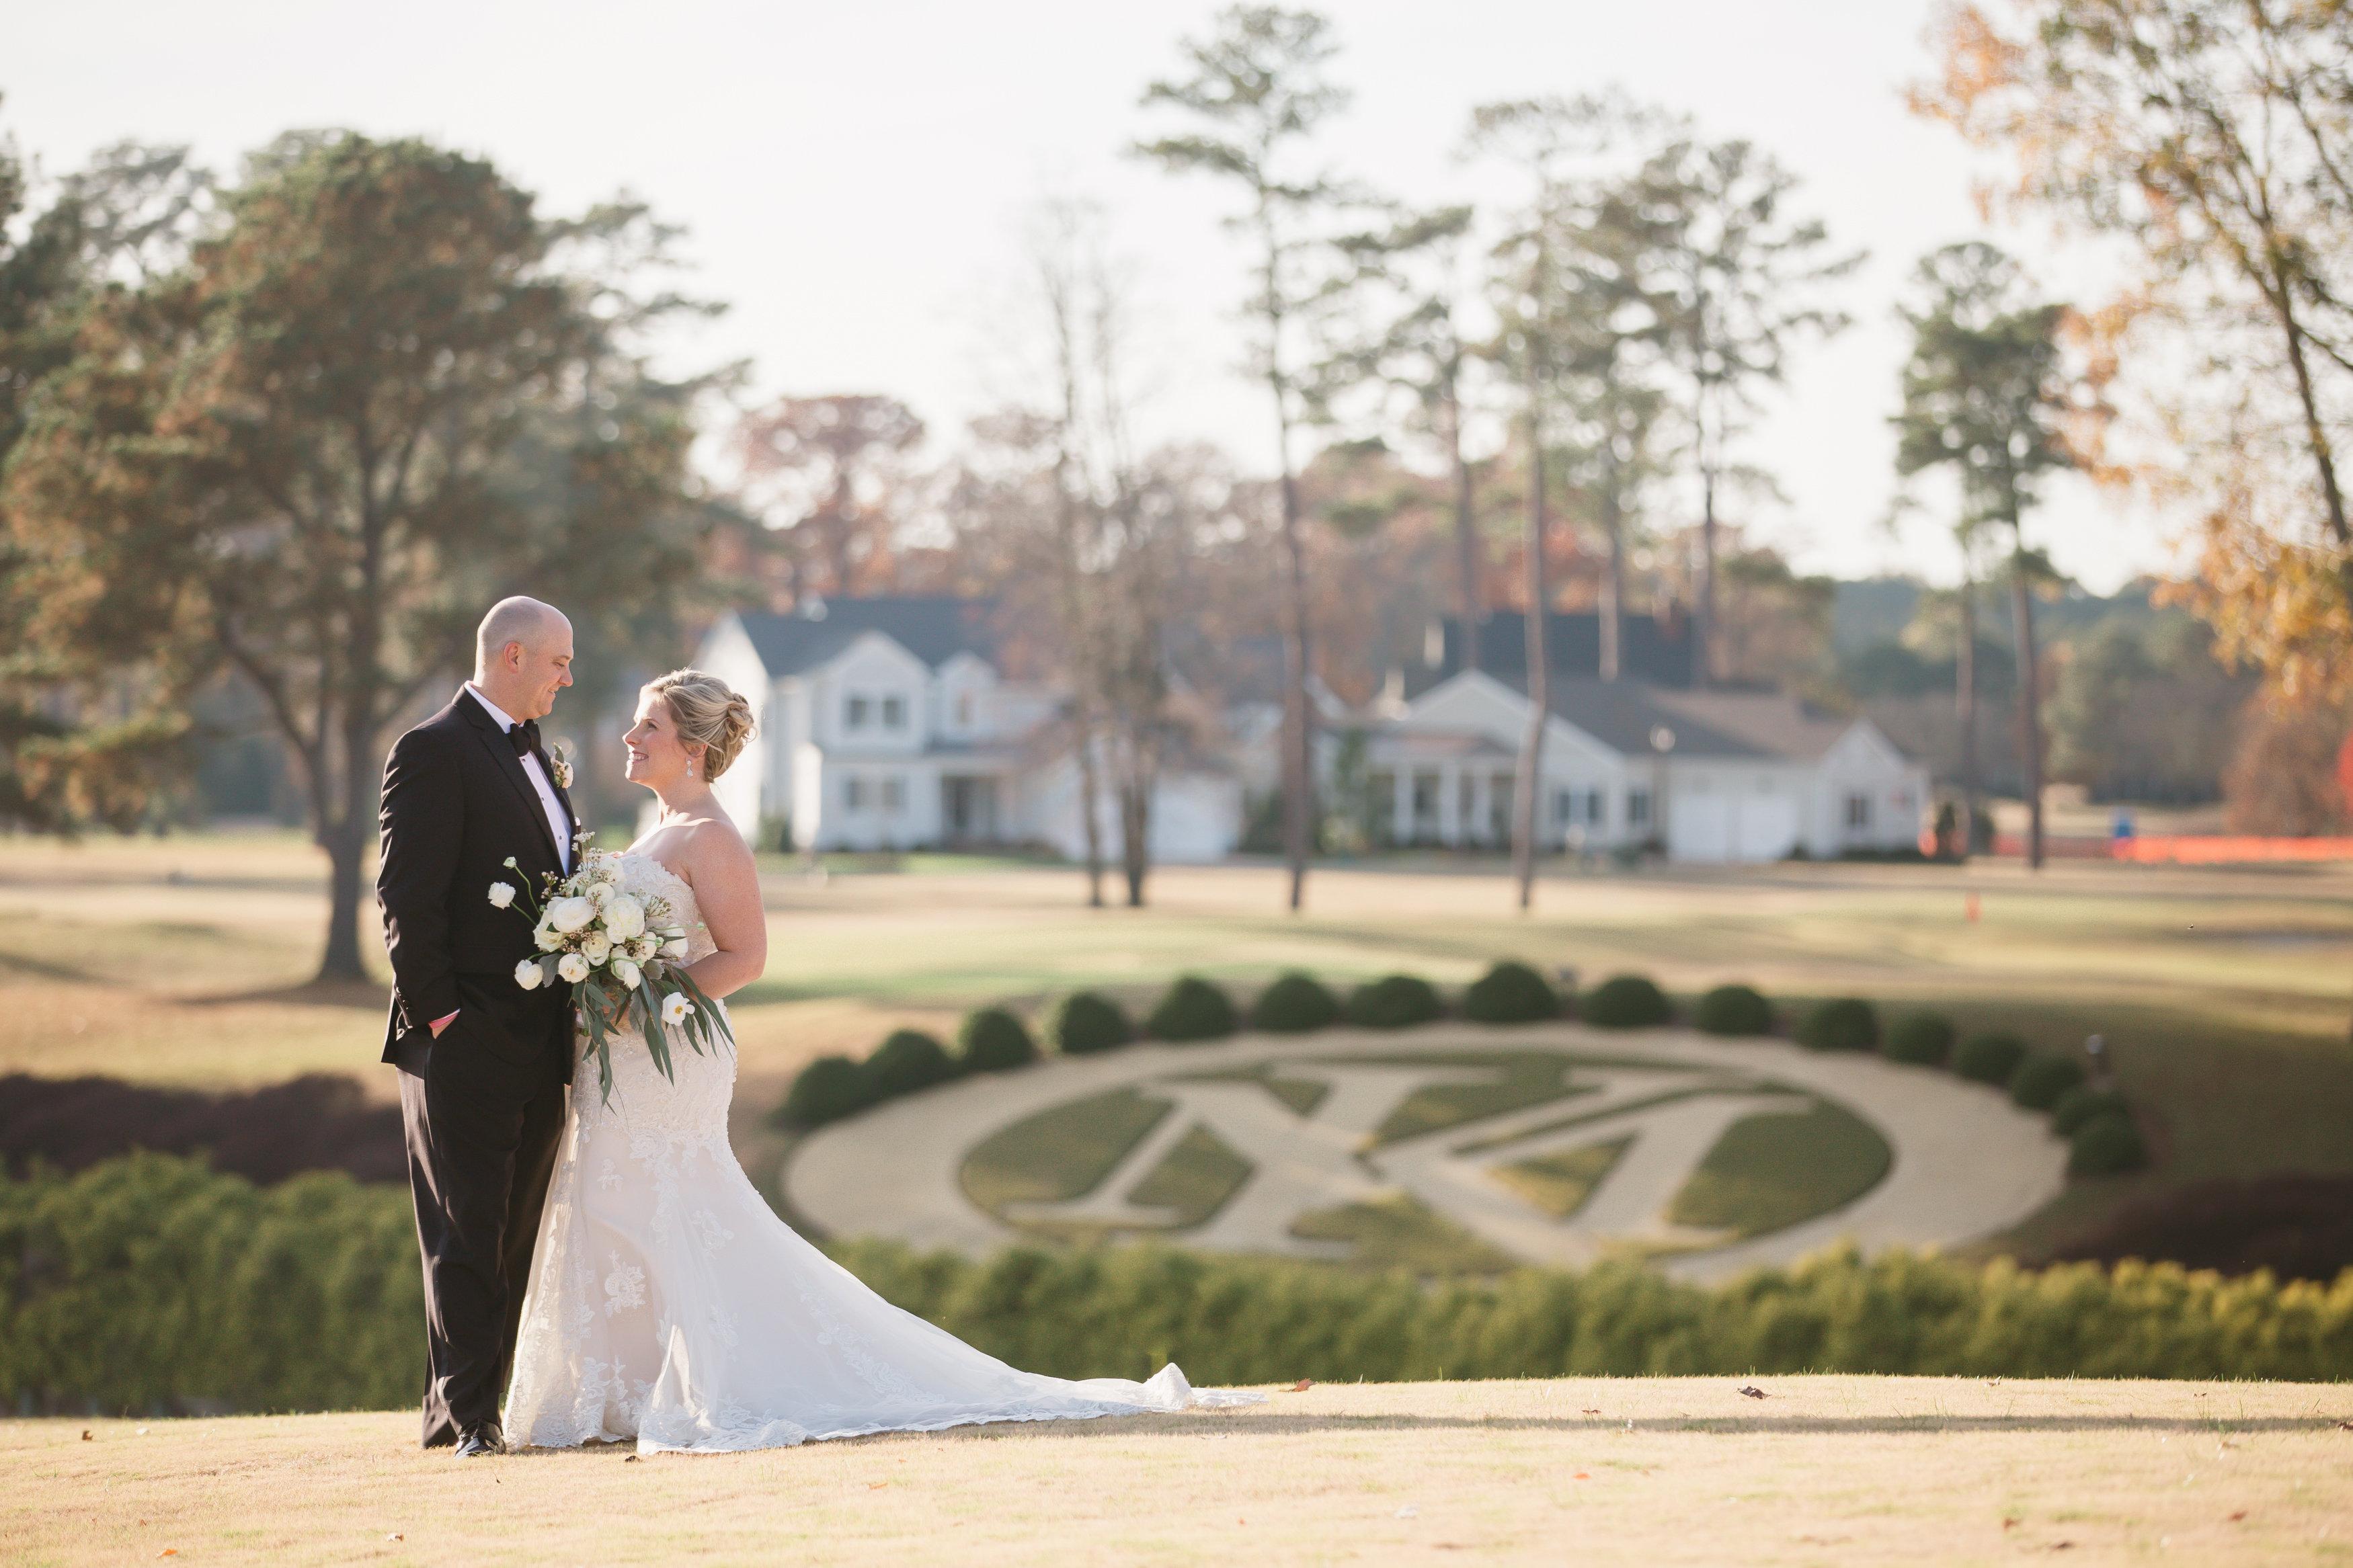 KM crest wedding photo